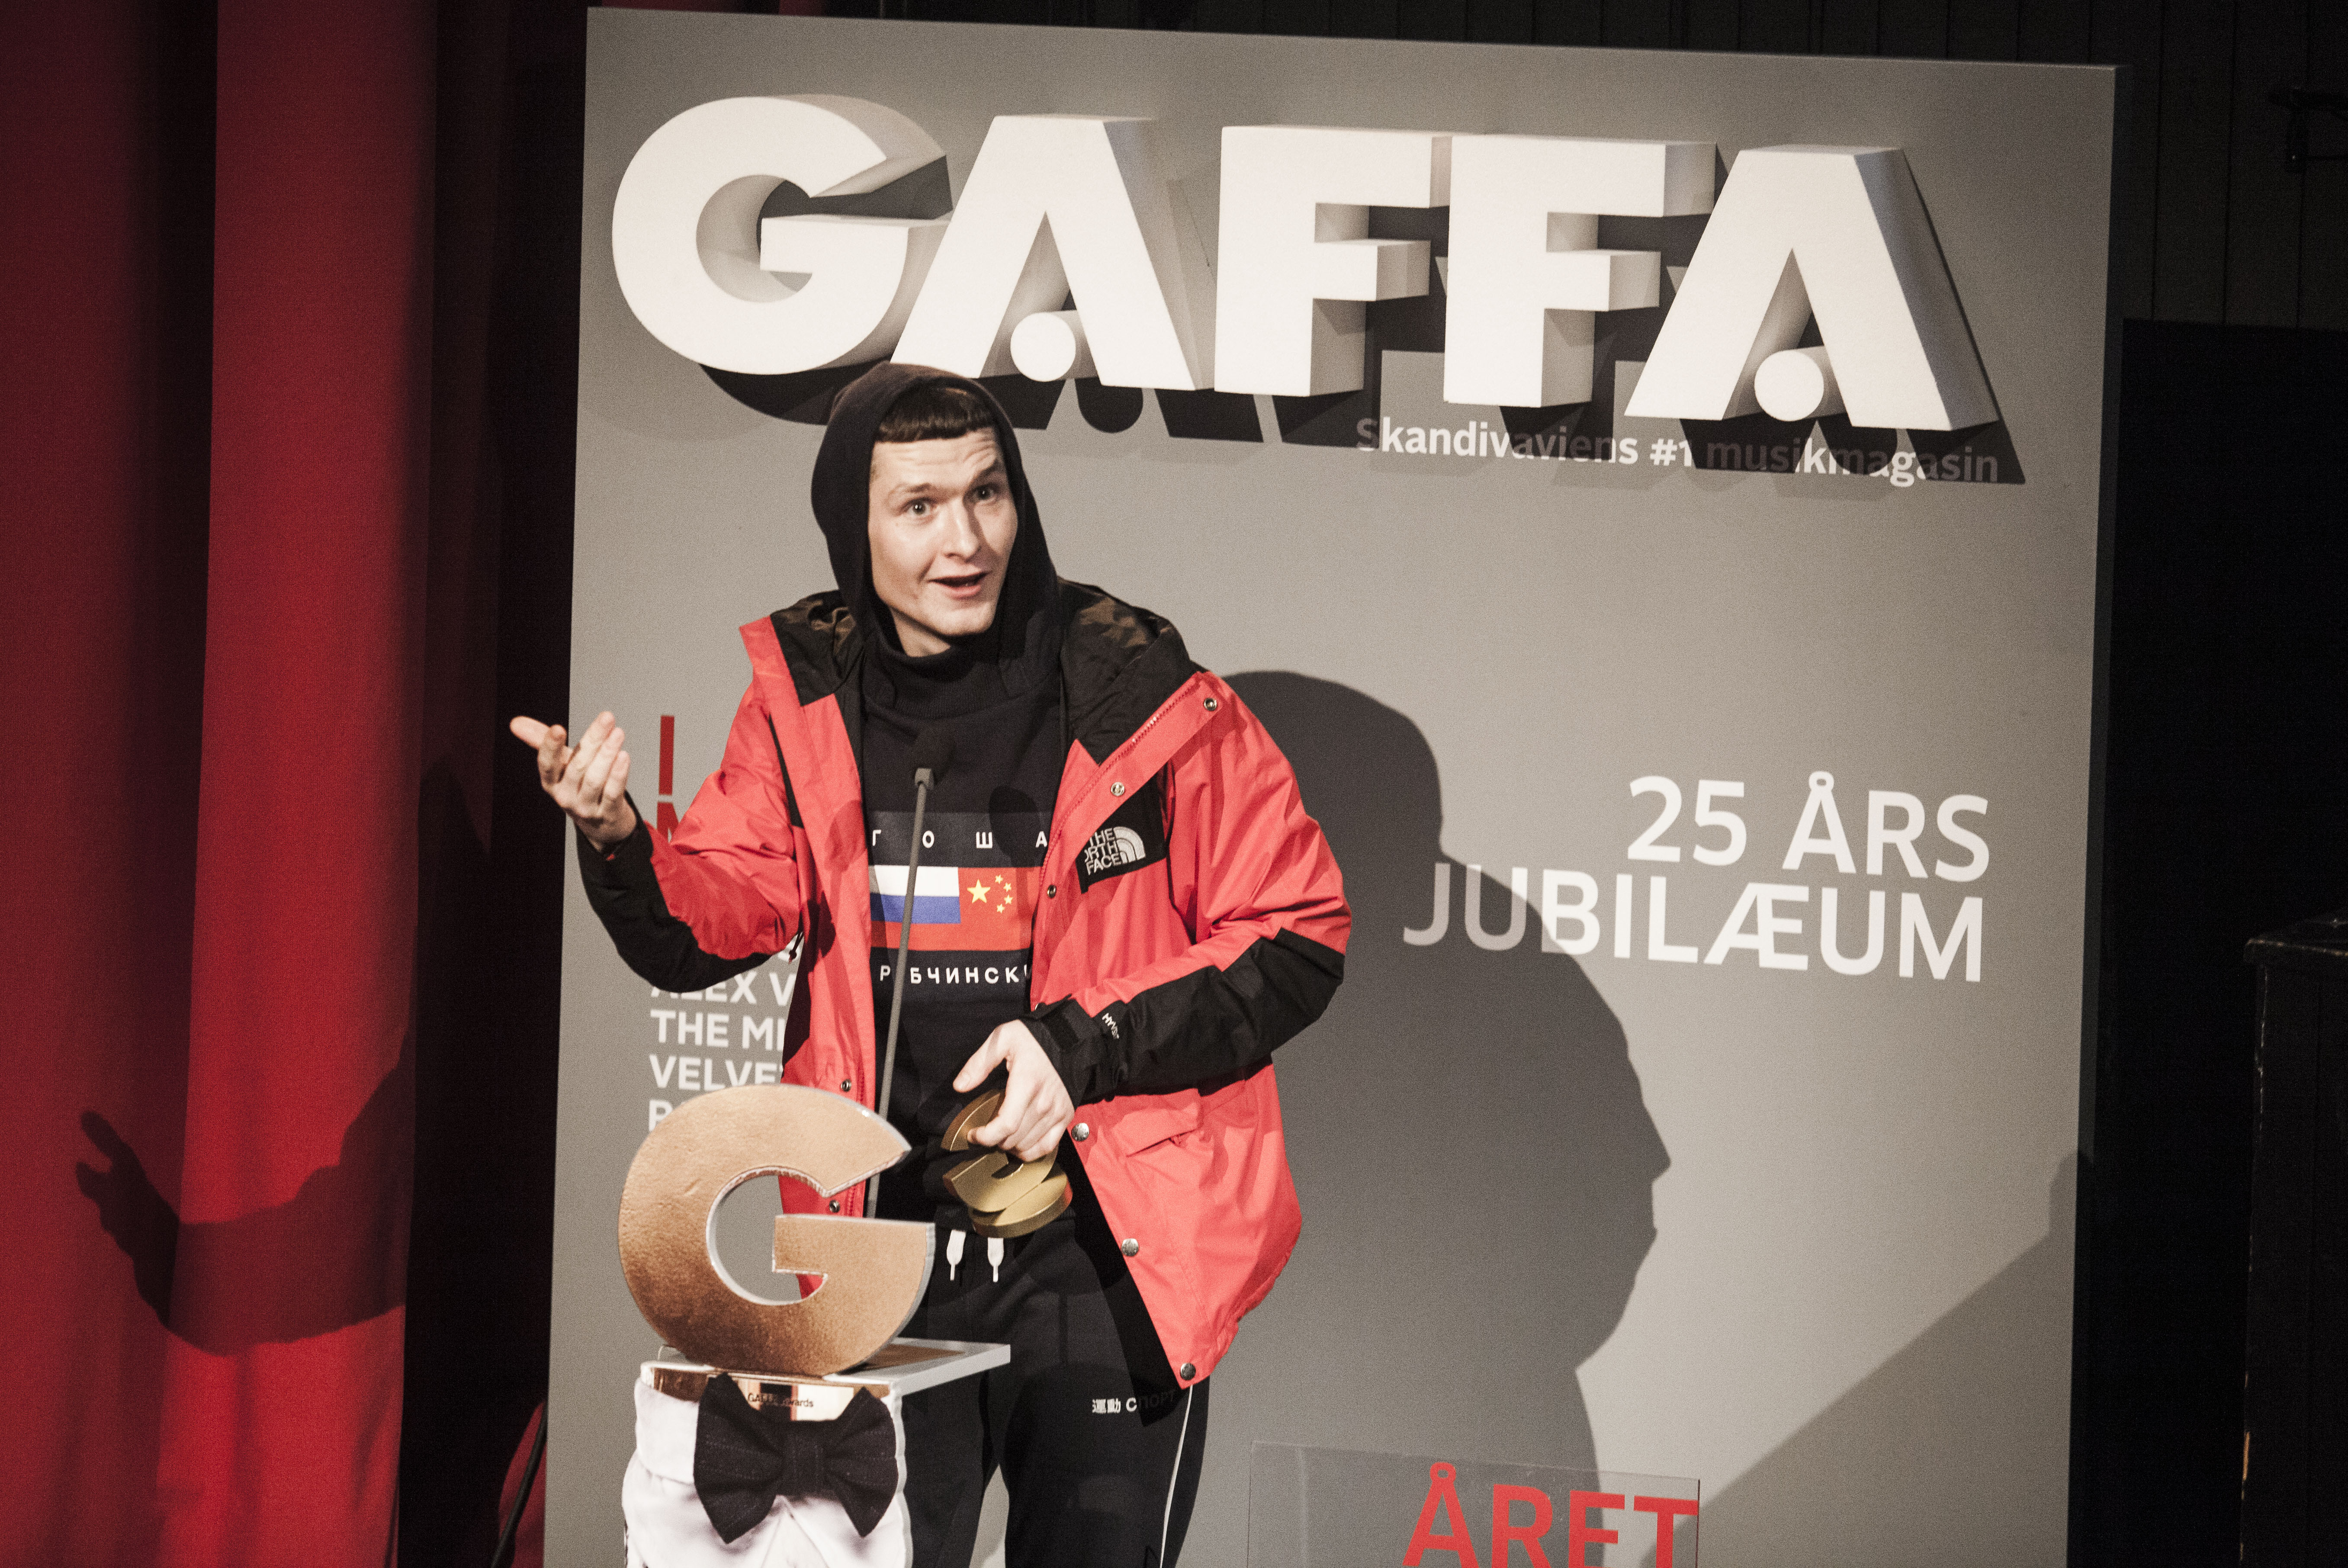 GAFFAprisen2015_HelenaLundquist_mindre_43